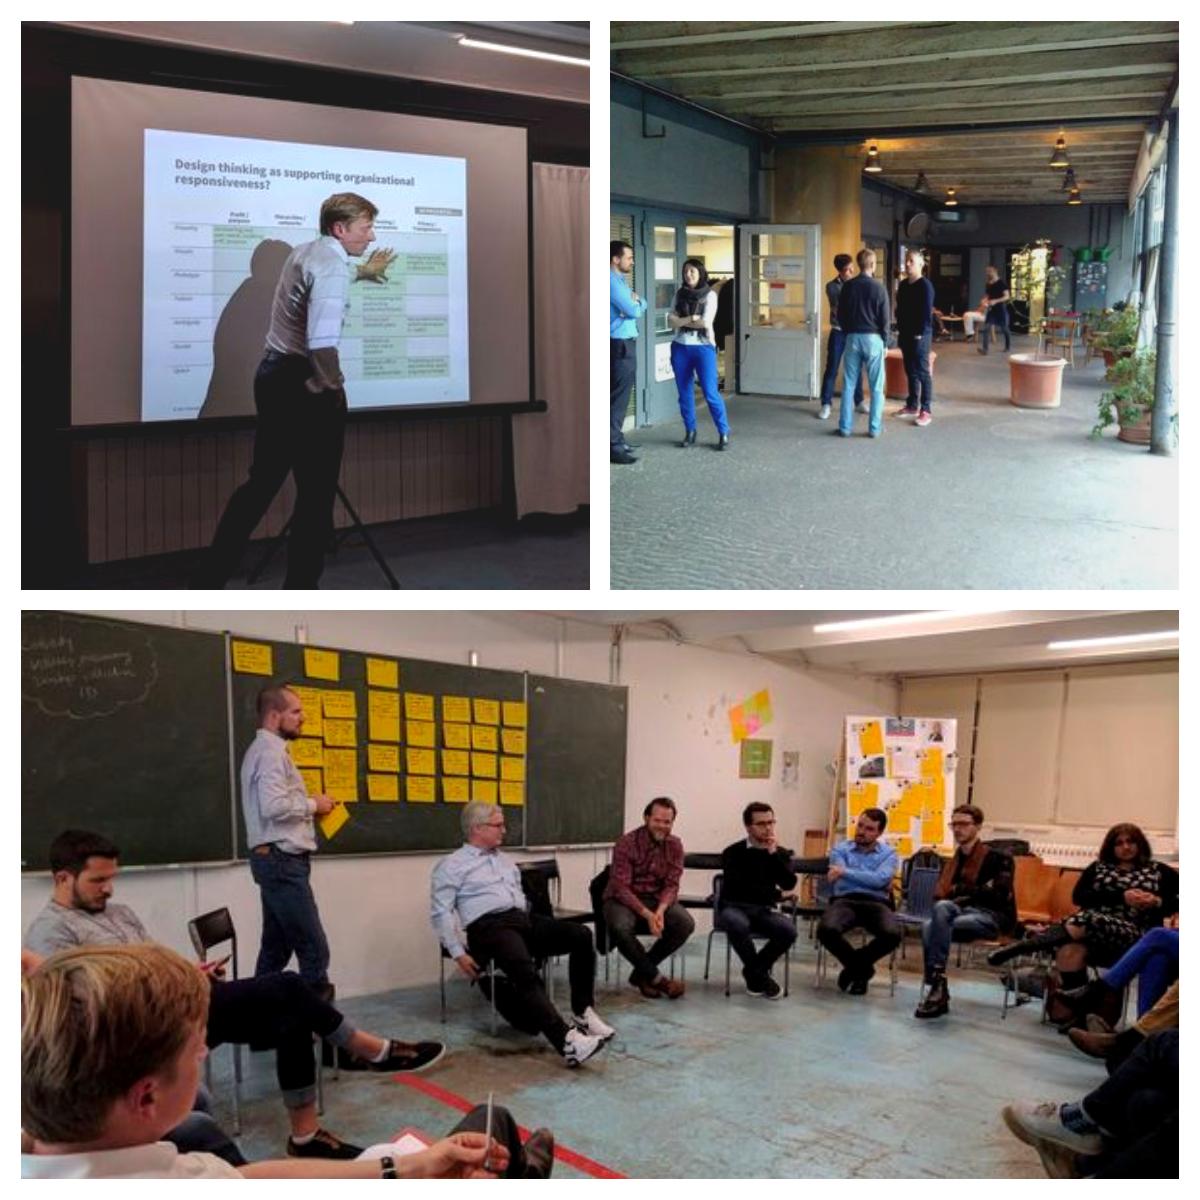 Management-Kits-Design-Thinking-Organizational-Responsiveness-Talk.jpg